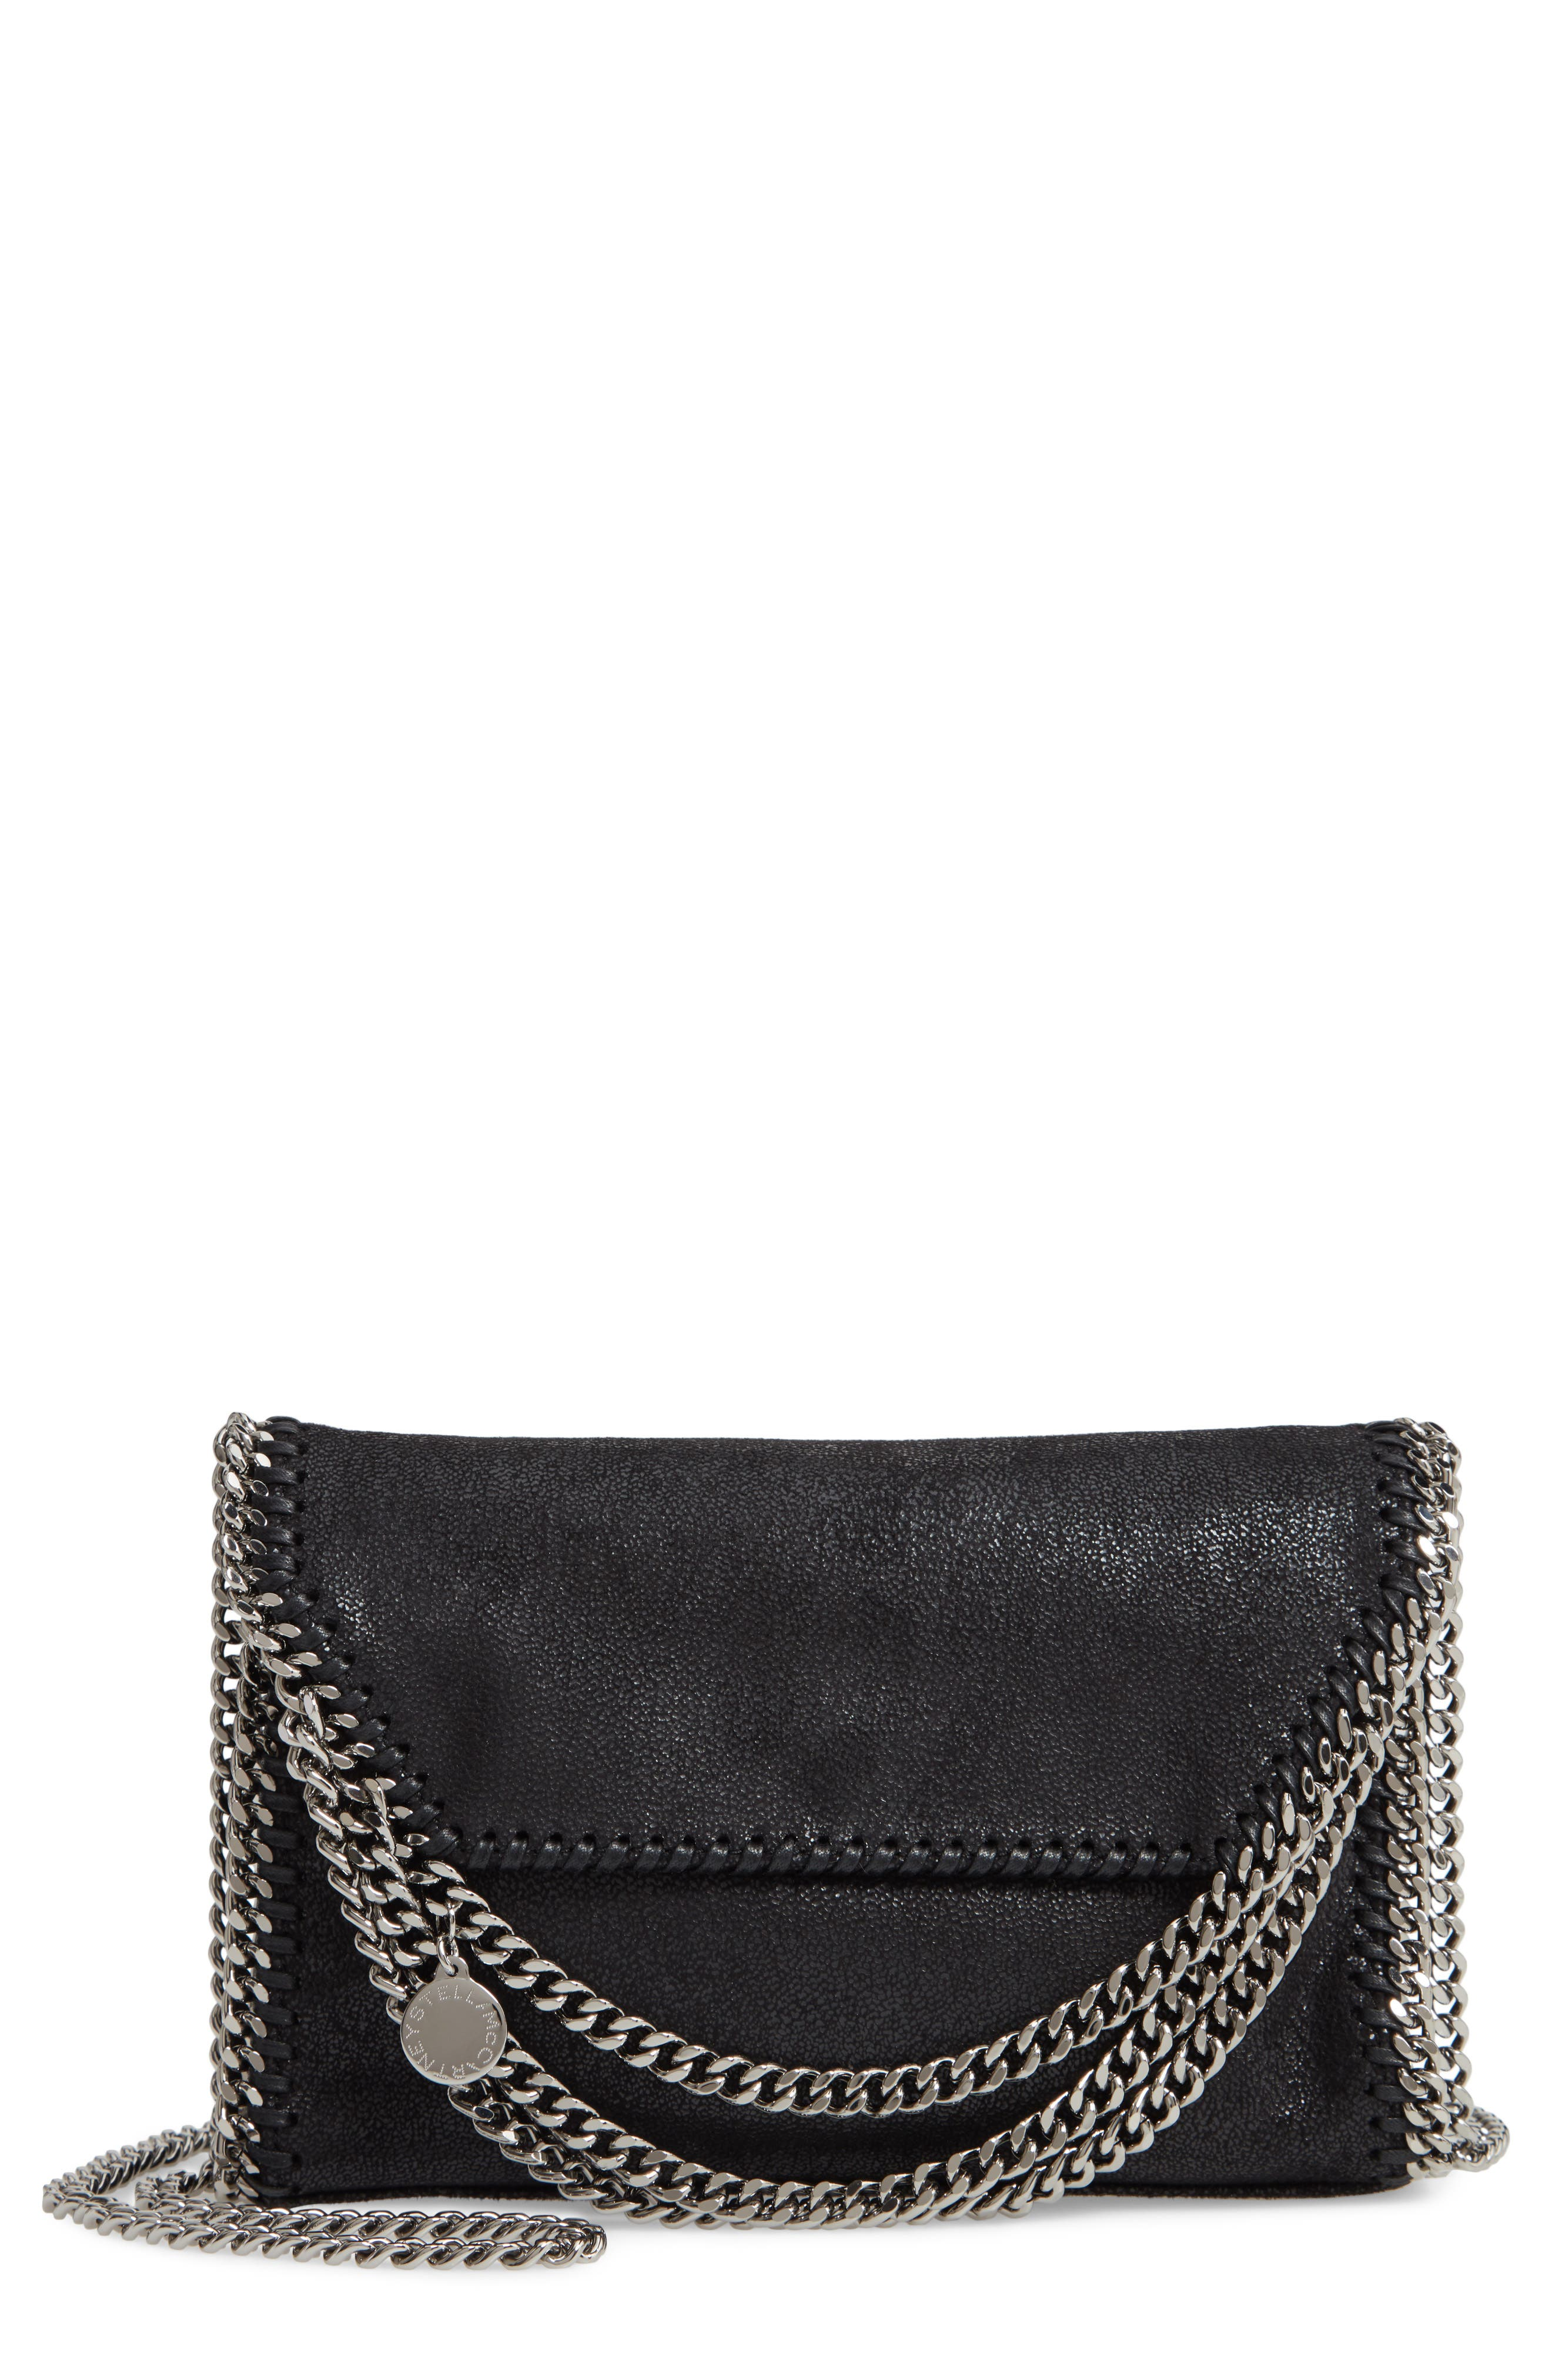 e74961ad Faux Leather Handbags, Purses & Wallets   Nordstrom